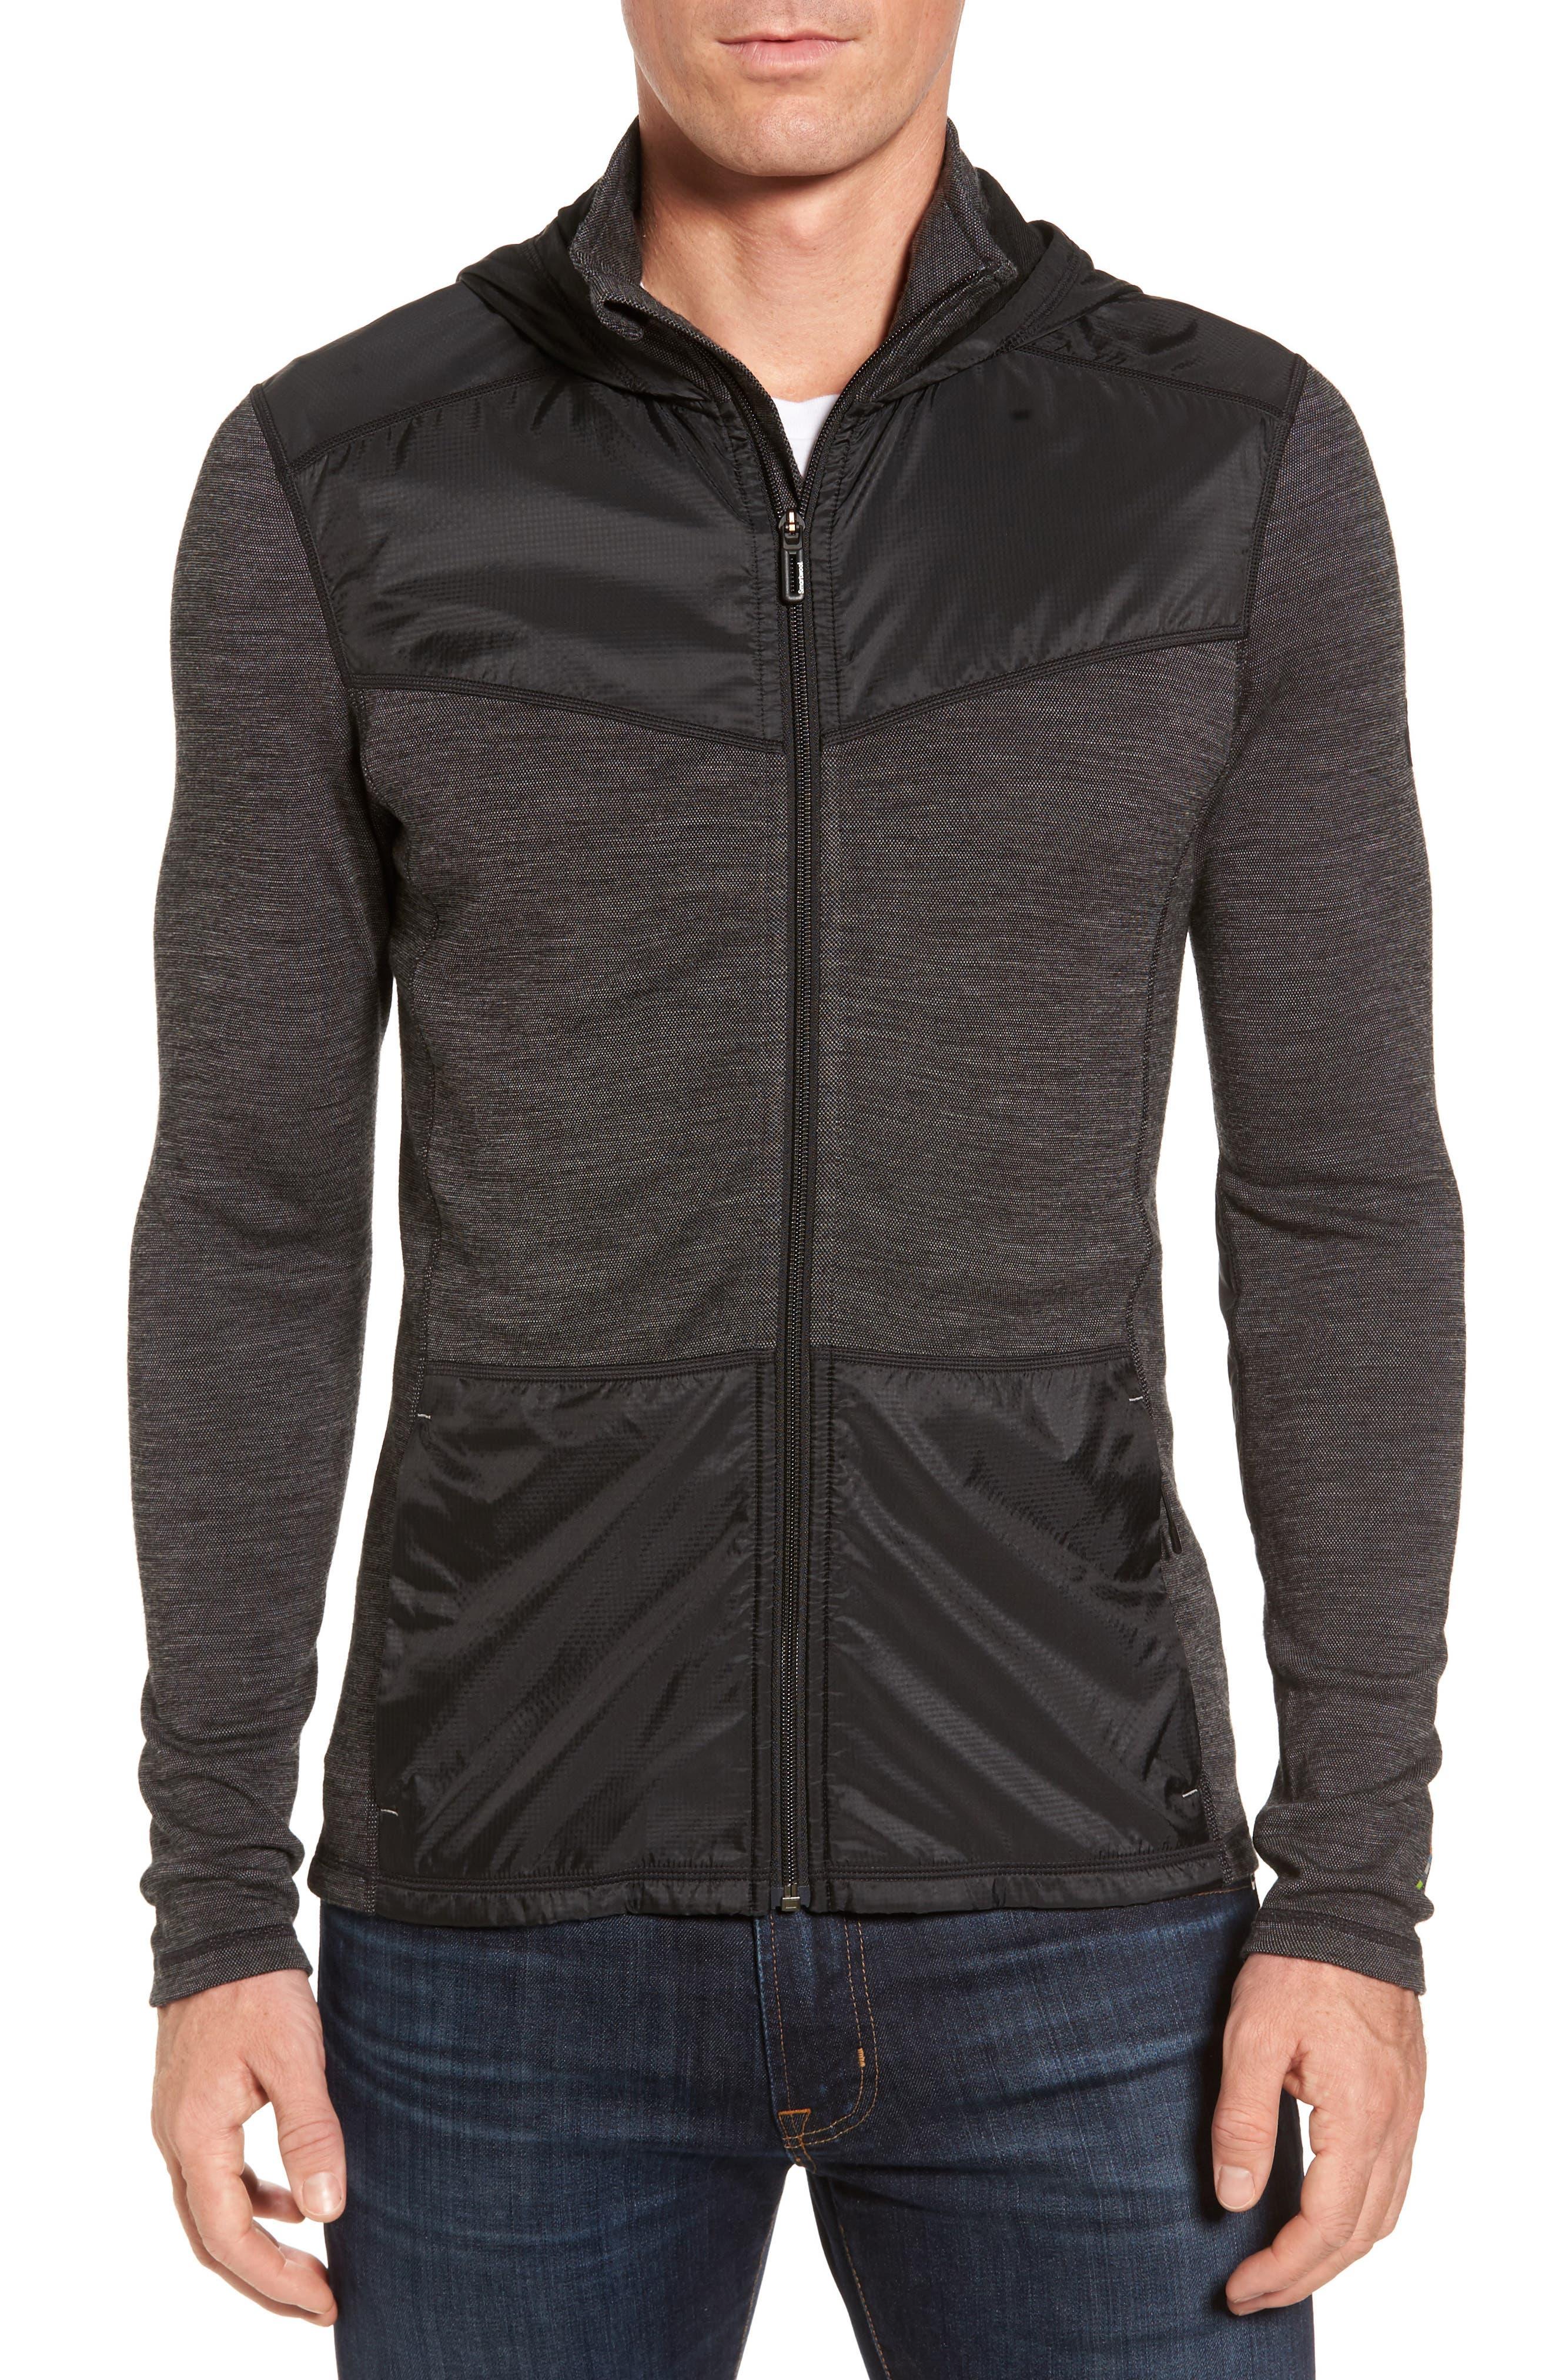 250 Sport Merino Wool Jacket,                         Main,                         color, Black